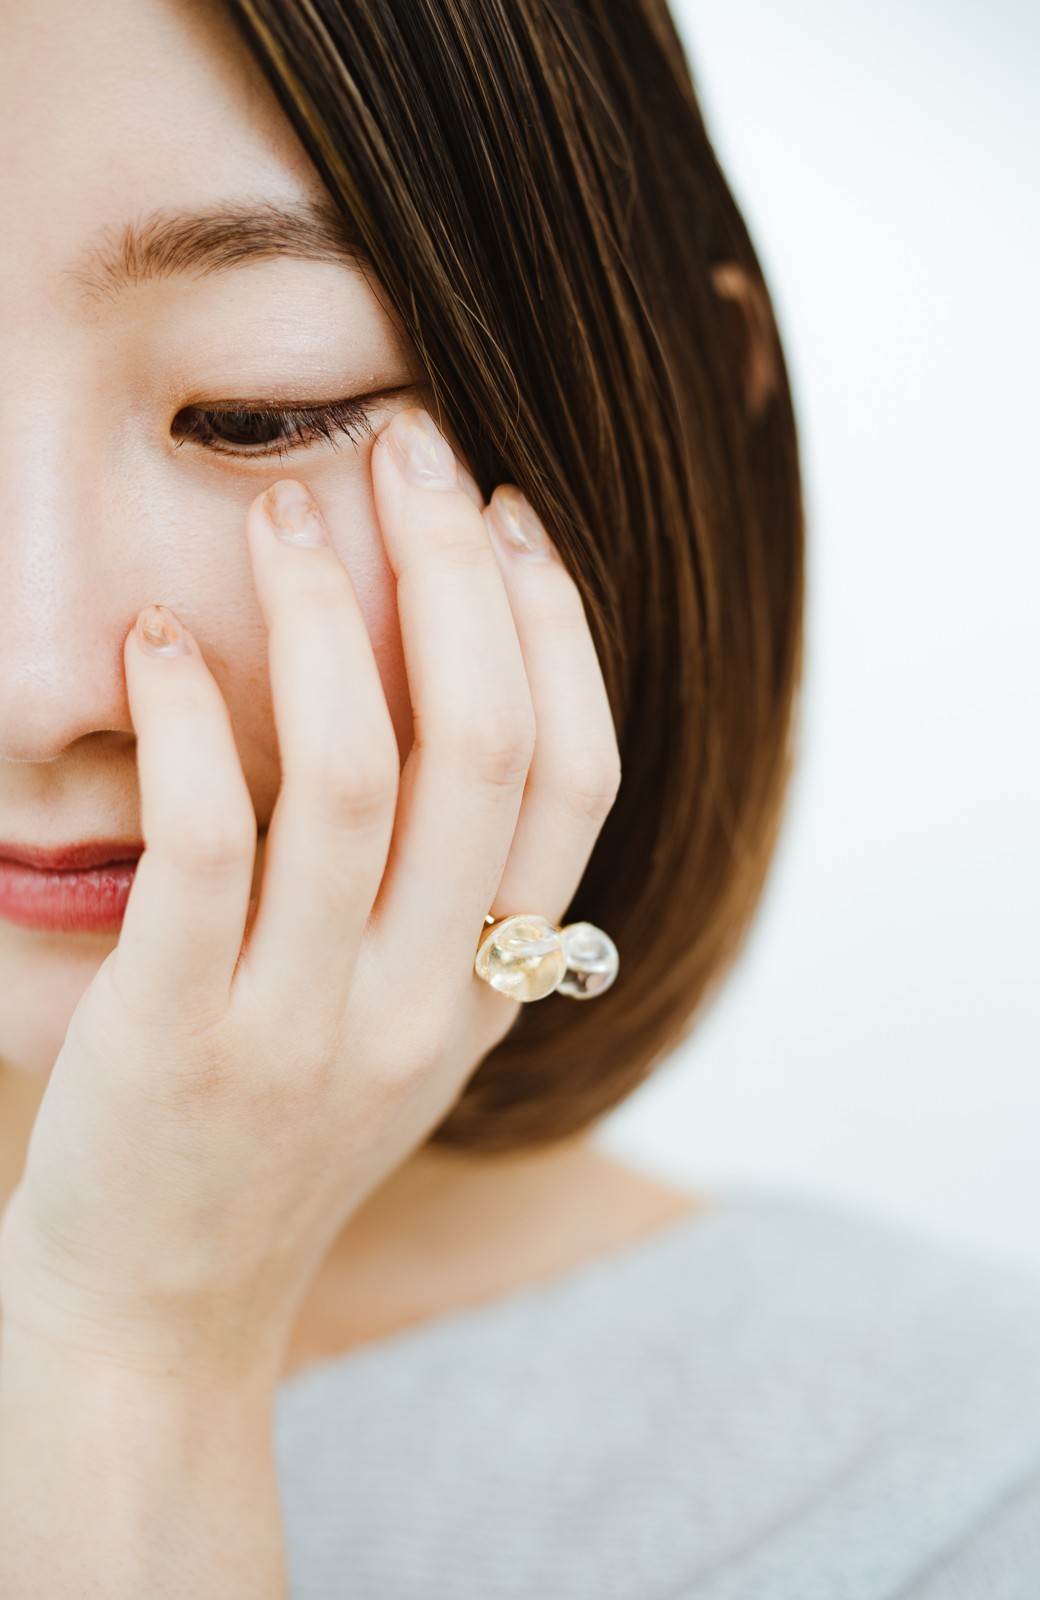 haco! てとひとて KANA MATSUNAMI チャリティー企画 W Glass dome リング <ゴールド>の商品写真8